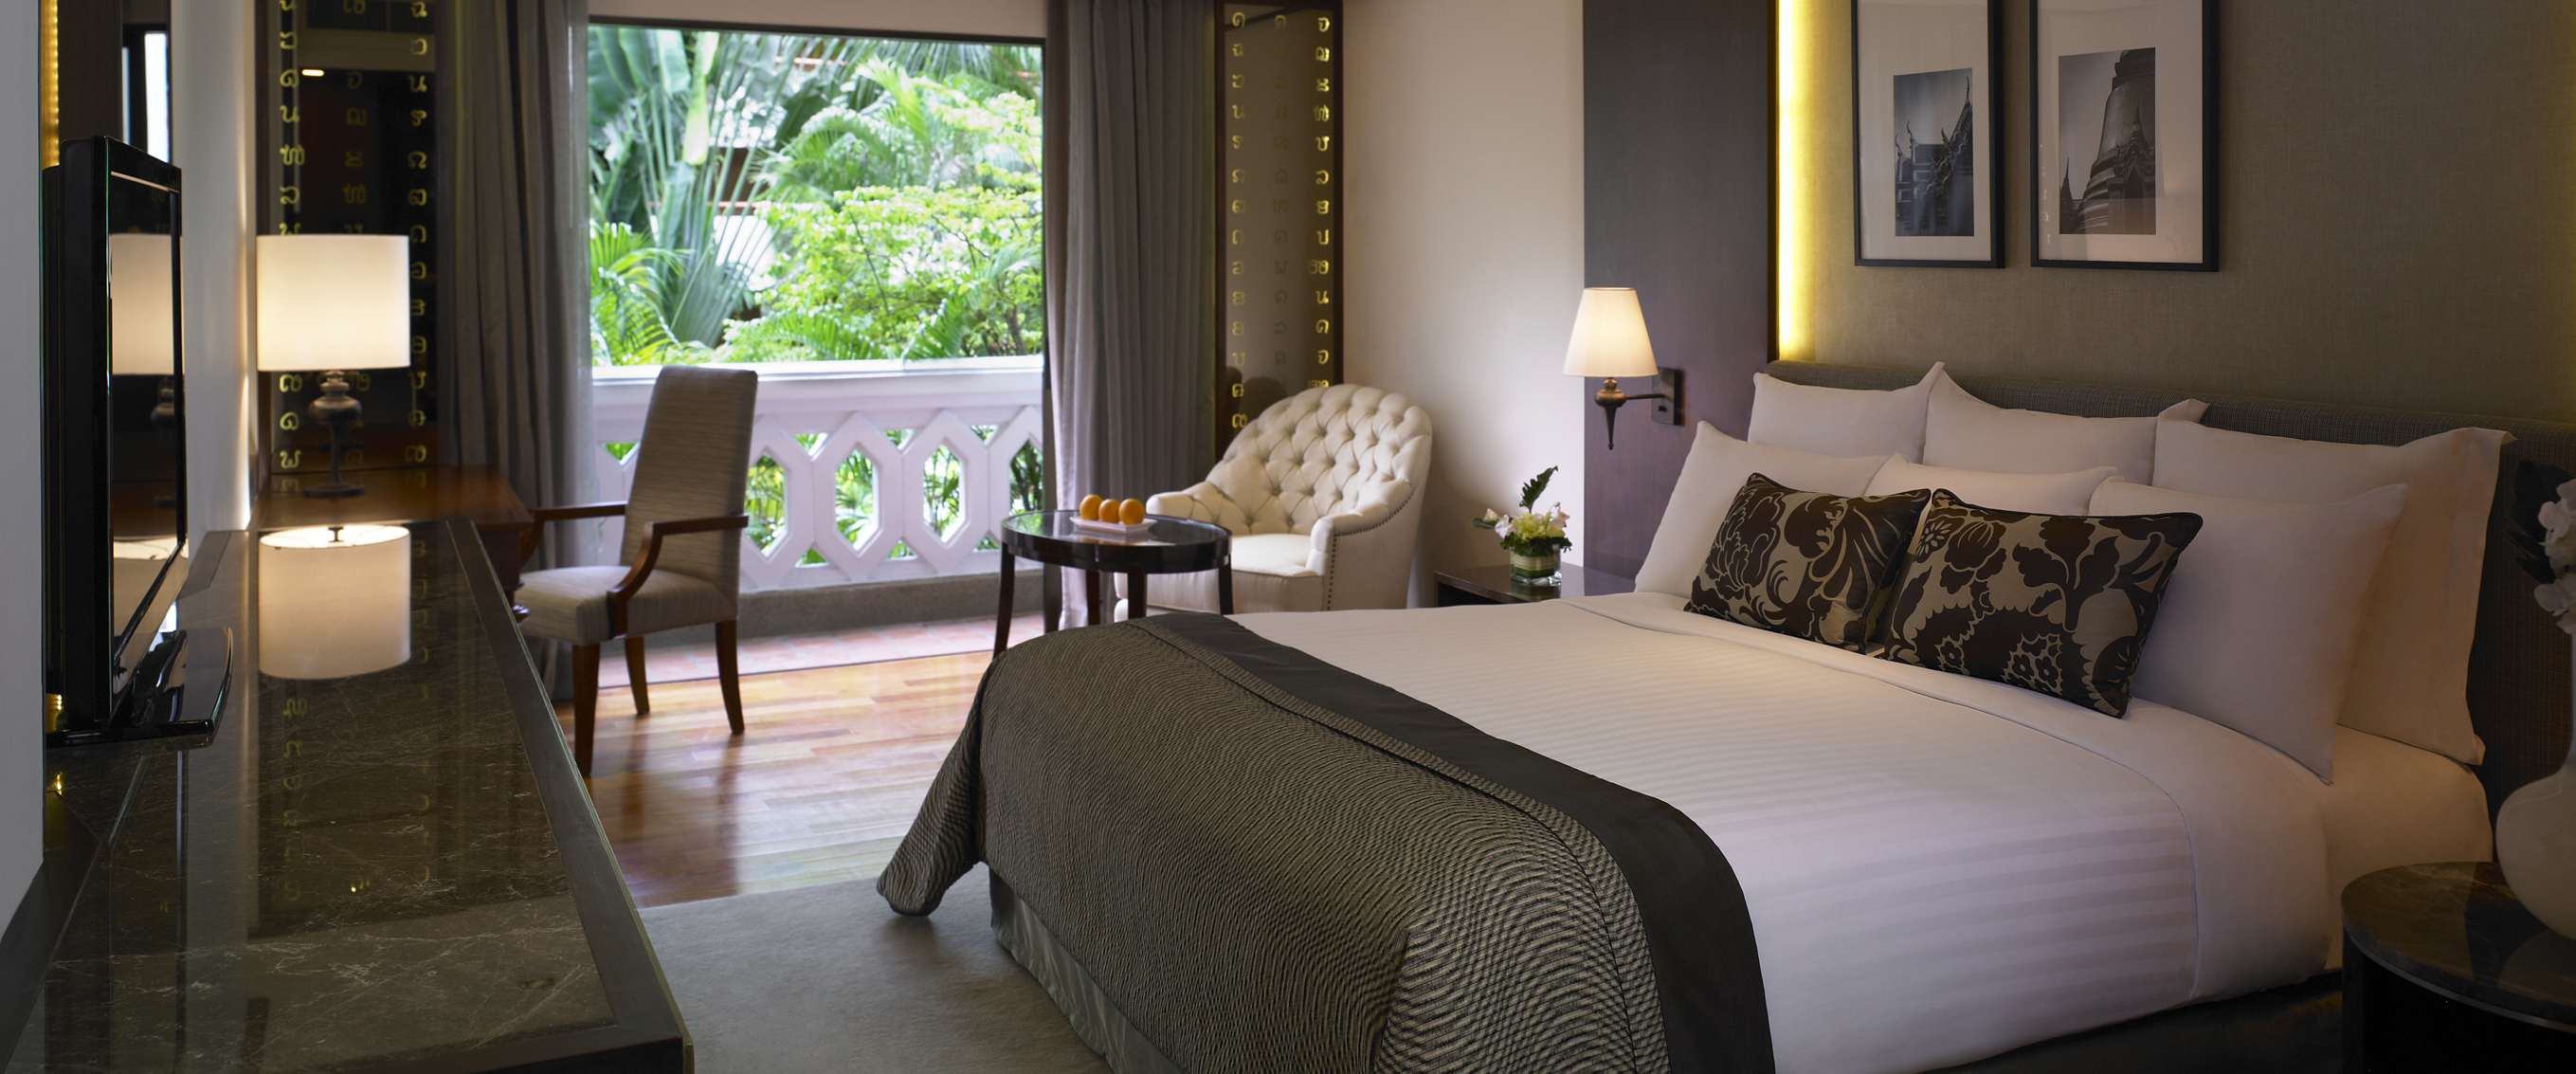 Deluxe_Room_Anantara_Bangkok